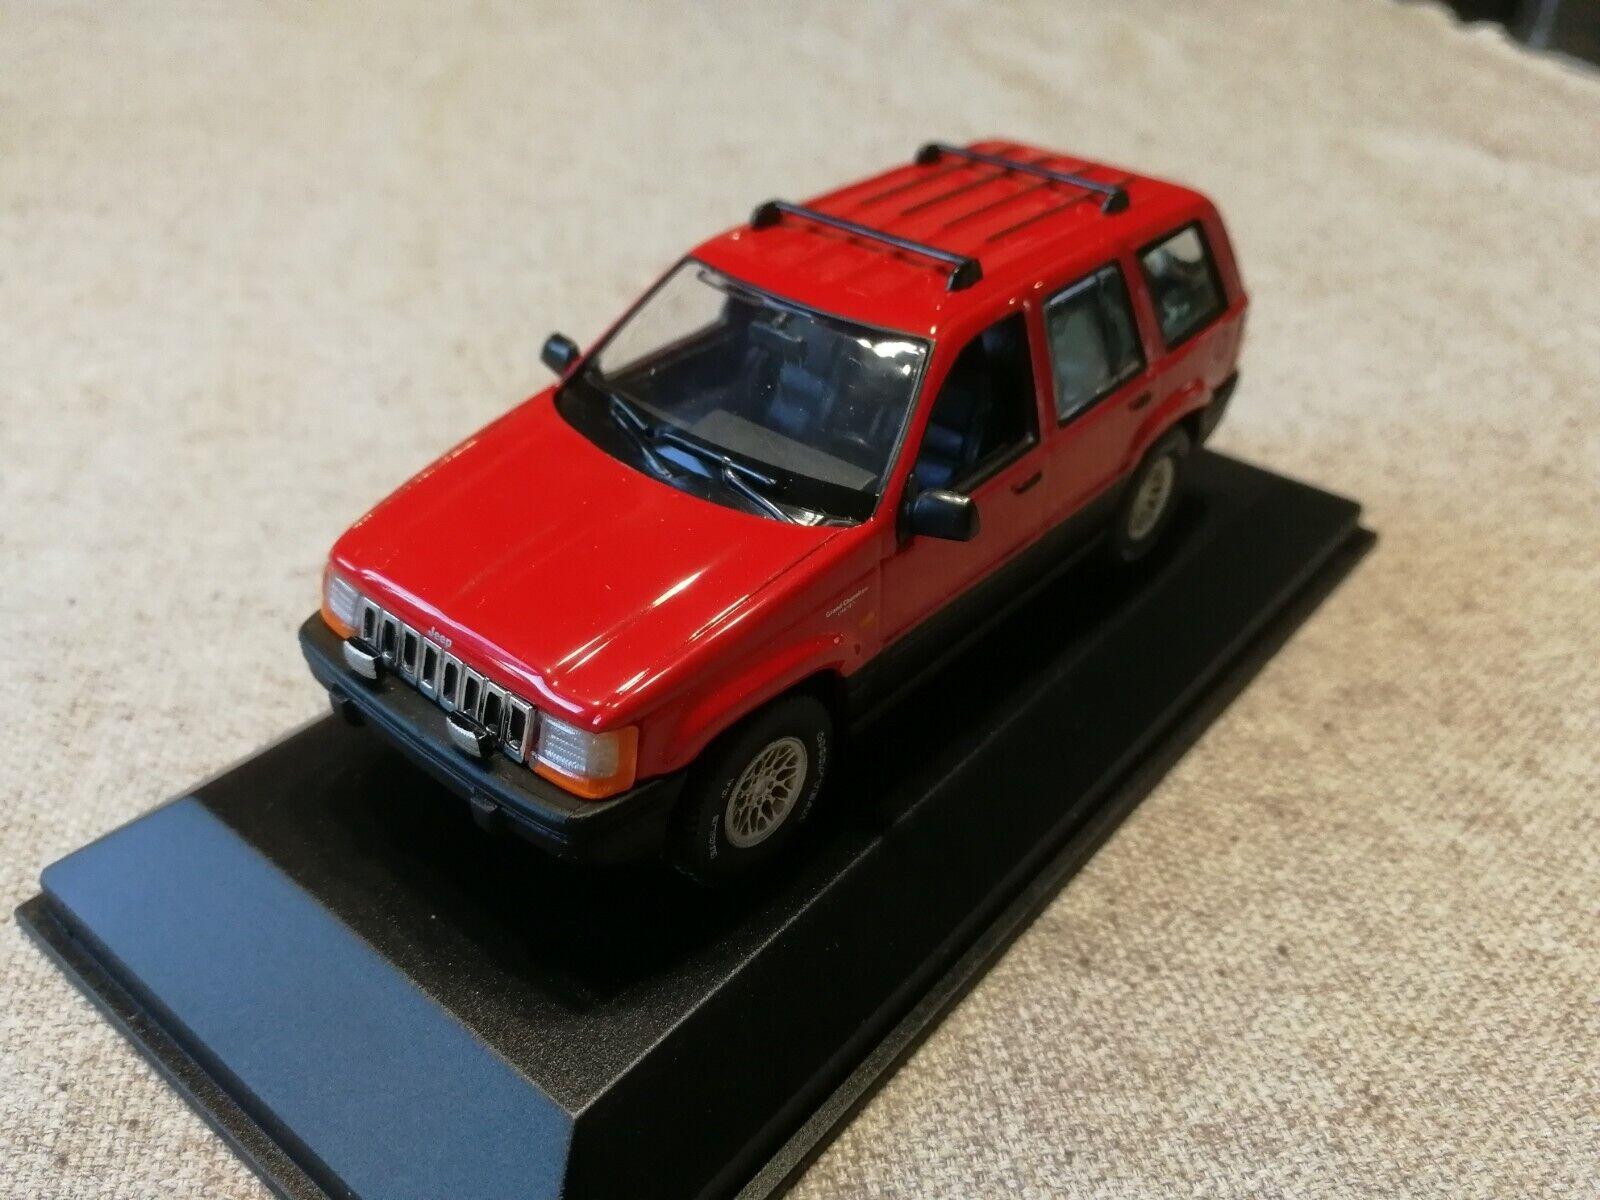 Jeep Grand Cherokee ZJ röd 1992-98 (Minichamps) 1 43 Herregud Rare Herregud